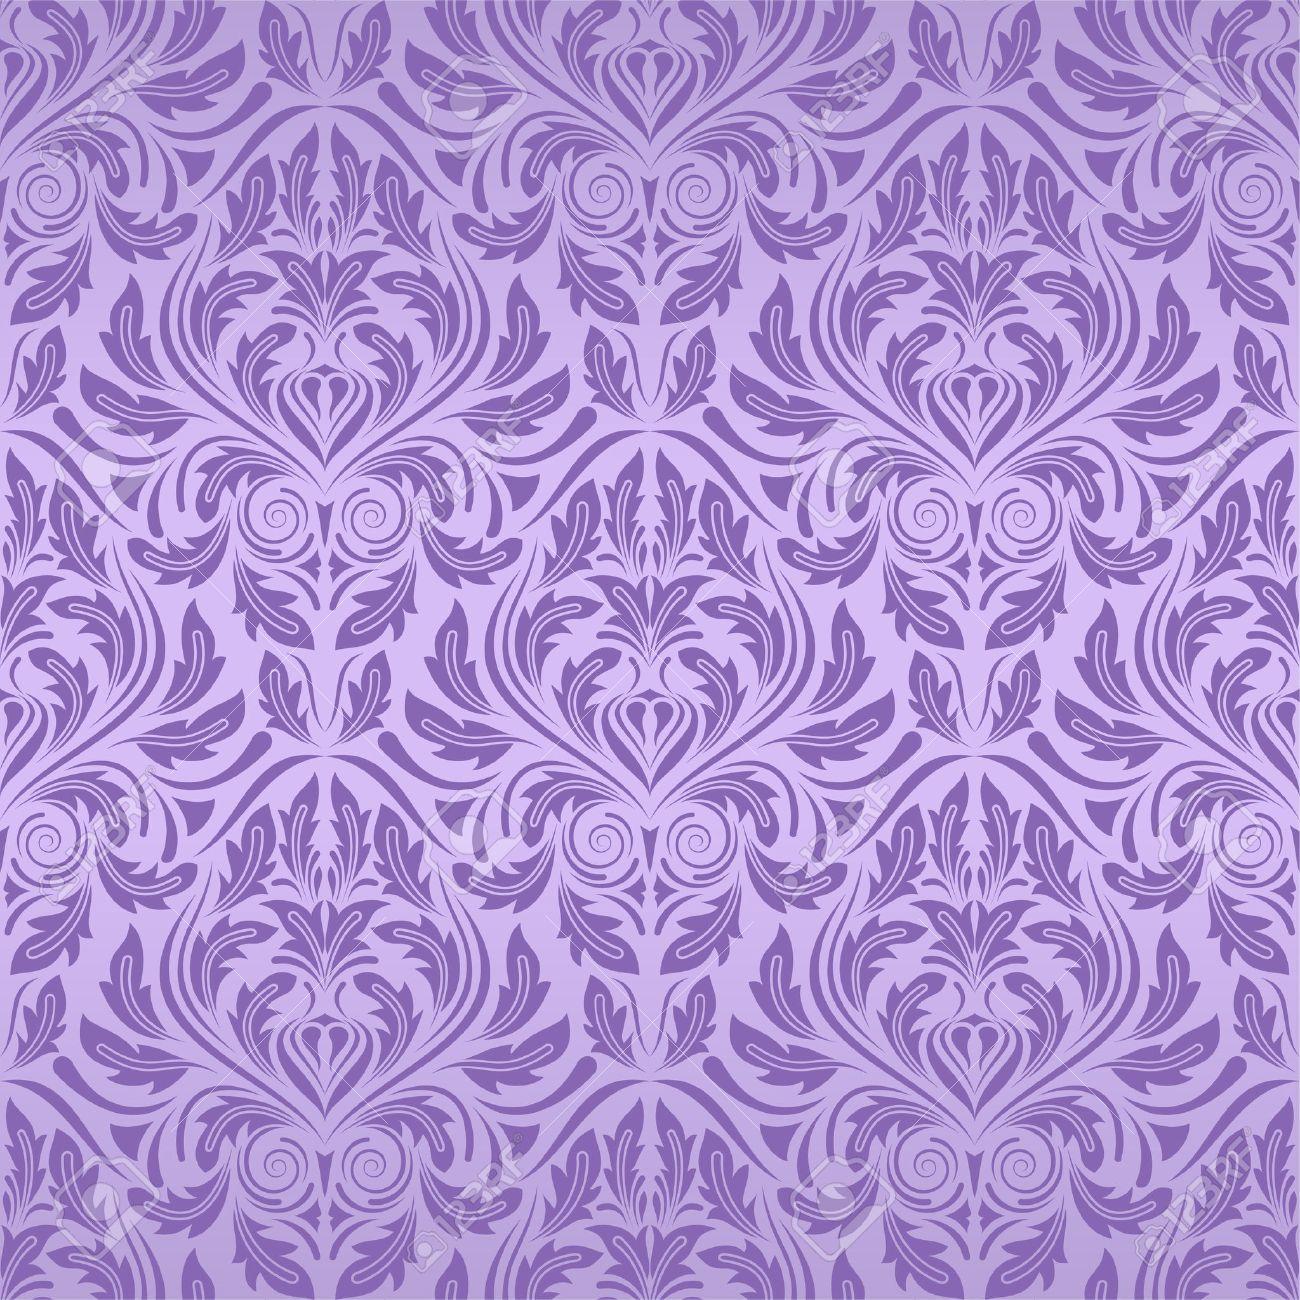 Textile Violet Imágenes De Archivo, Vectores, Textile Violet Fotos ...